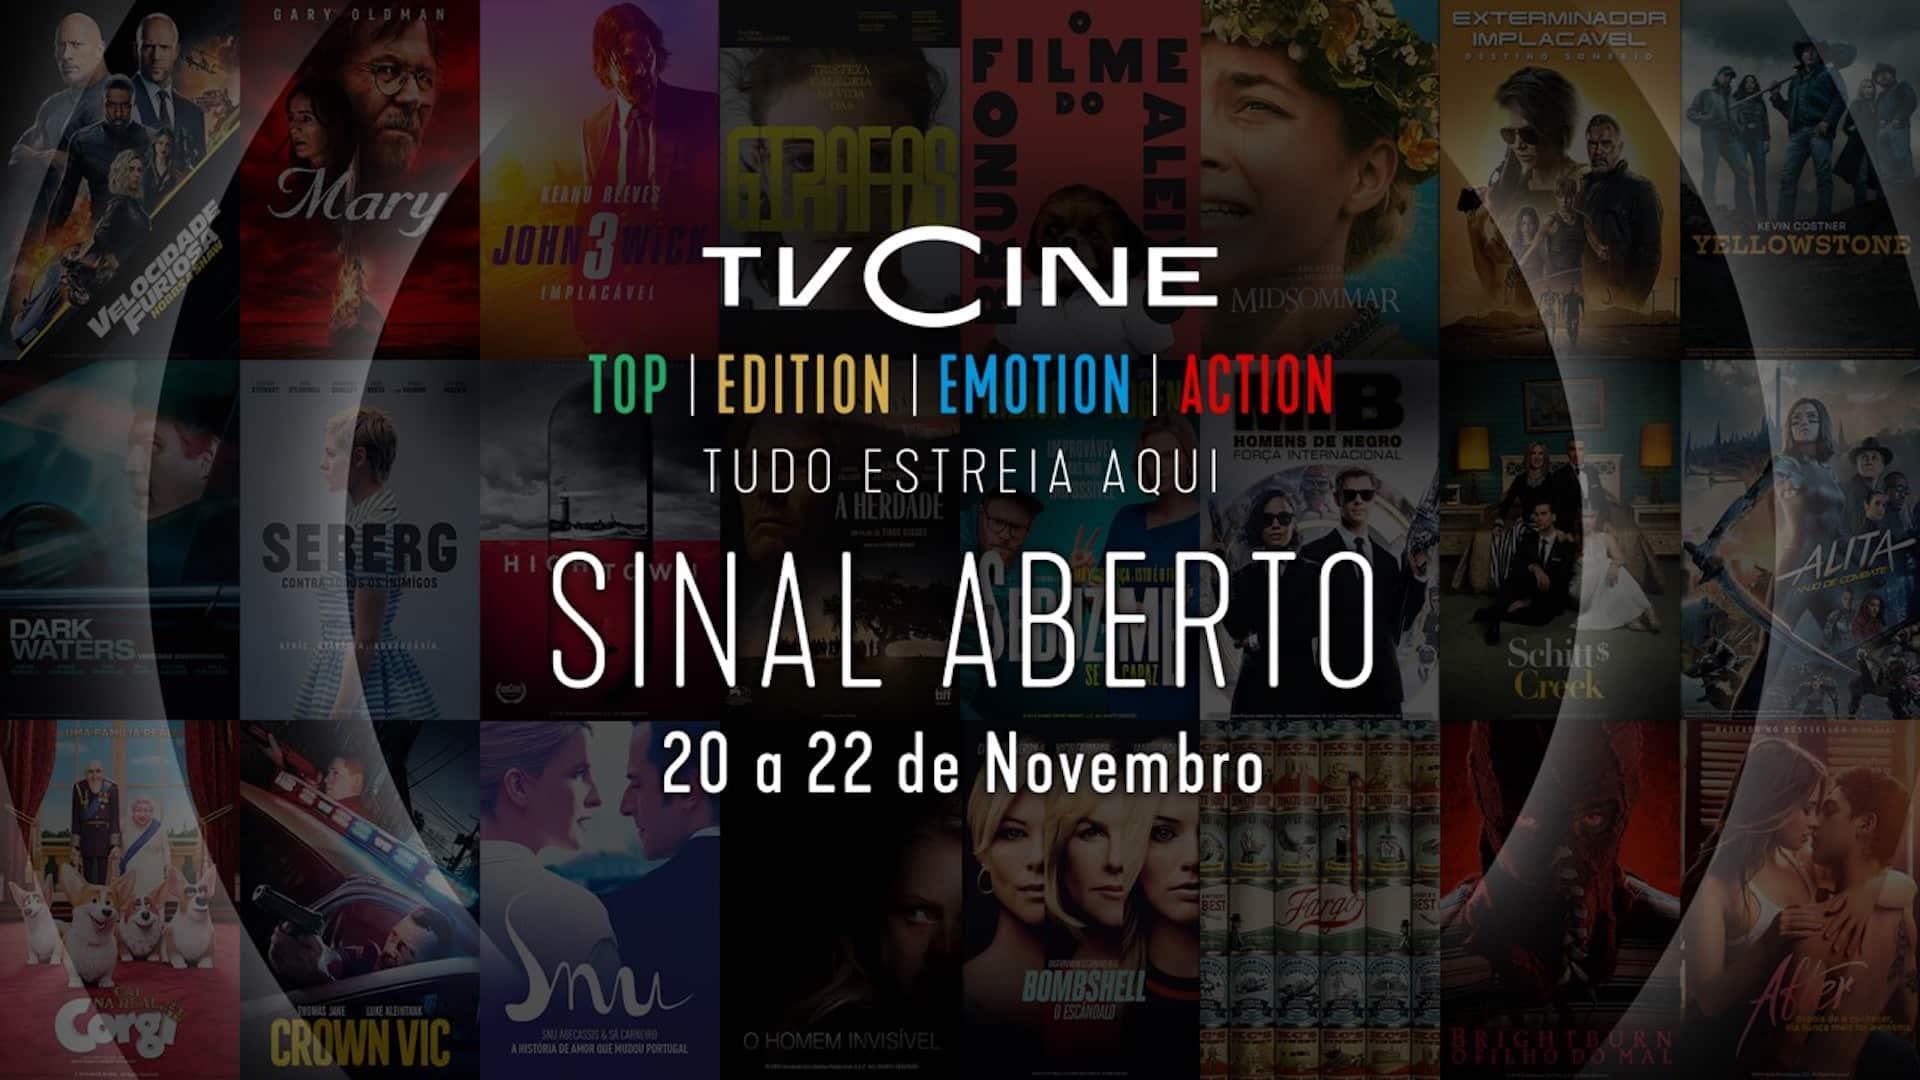 Sinal Aberto Tvcine